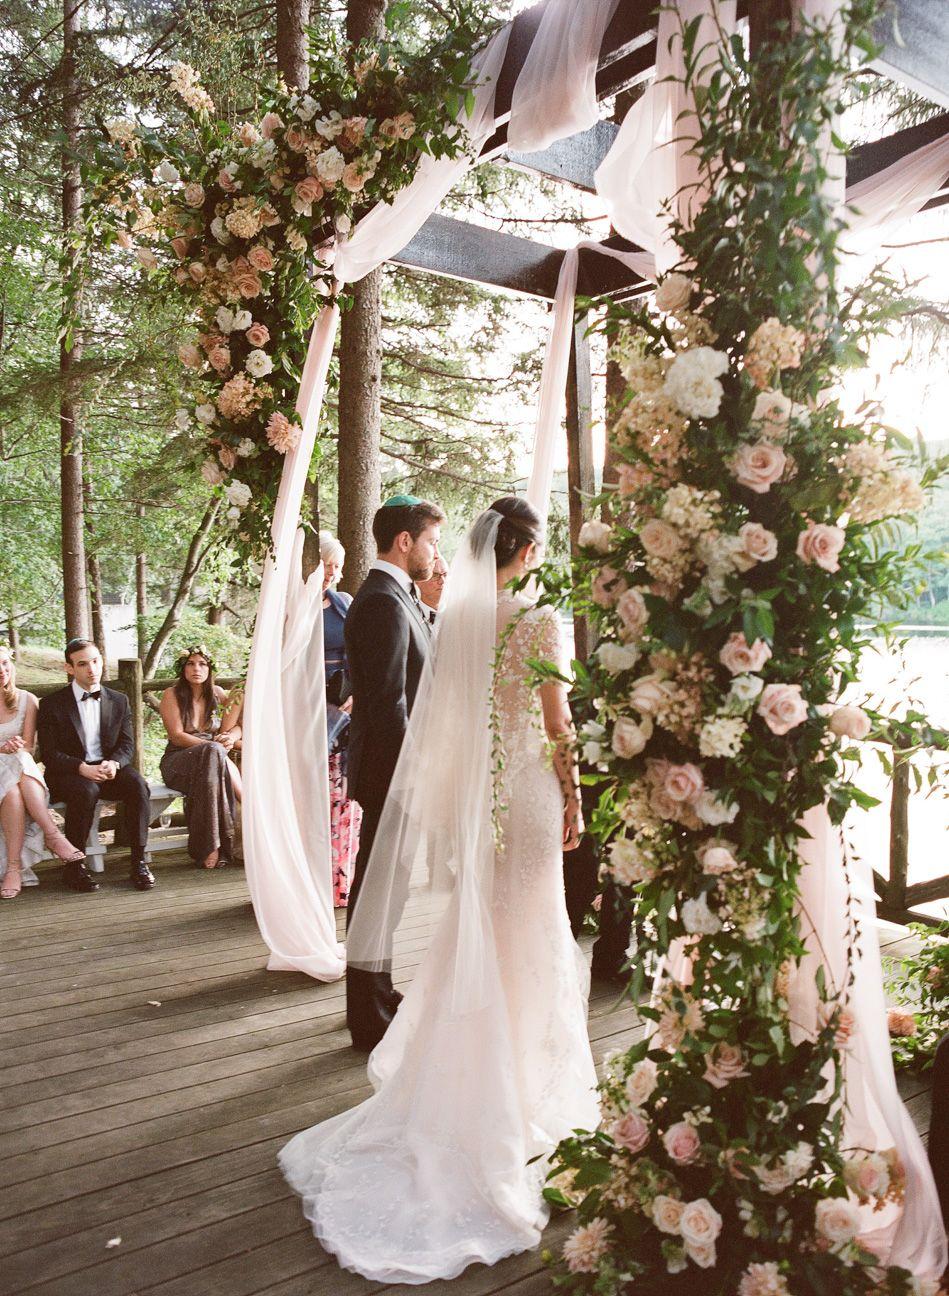 KarenHillPhotography-Parizat-Wedding-0586.jpg